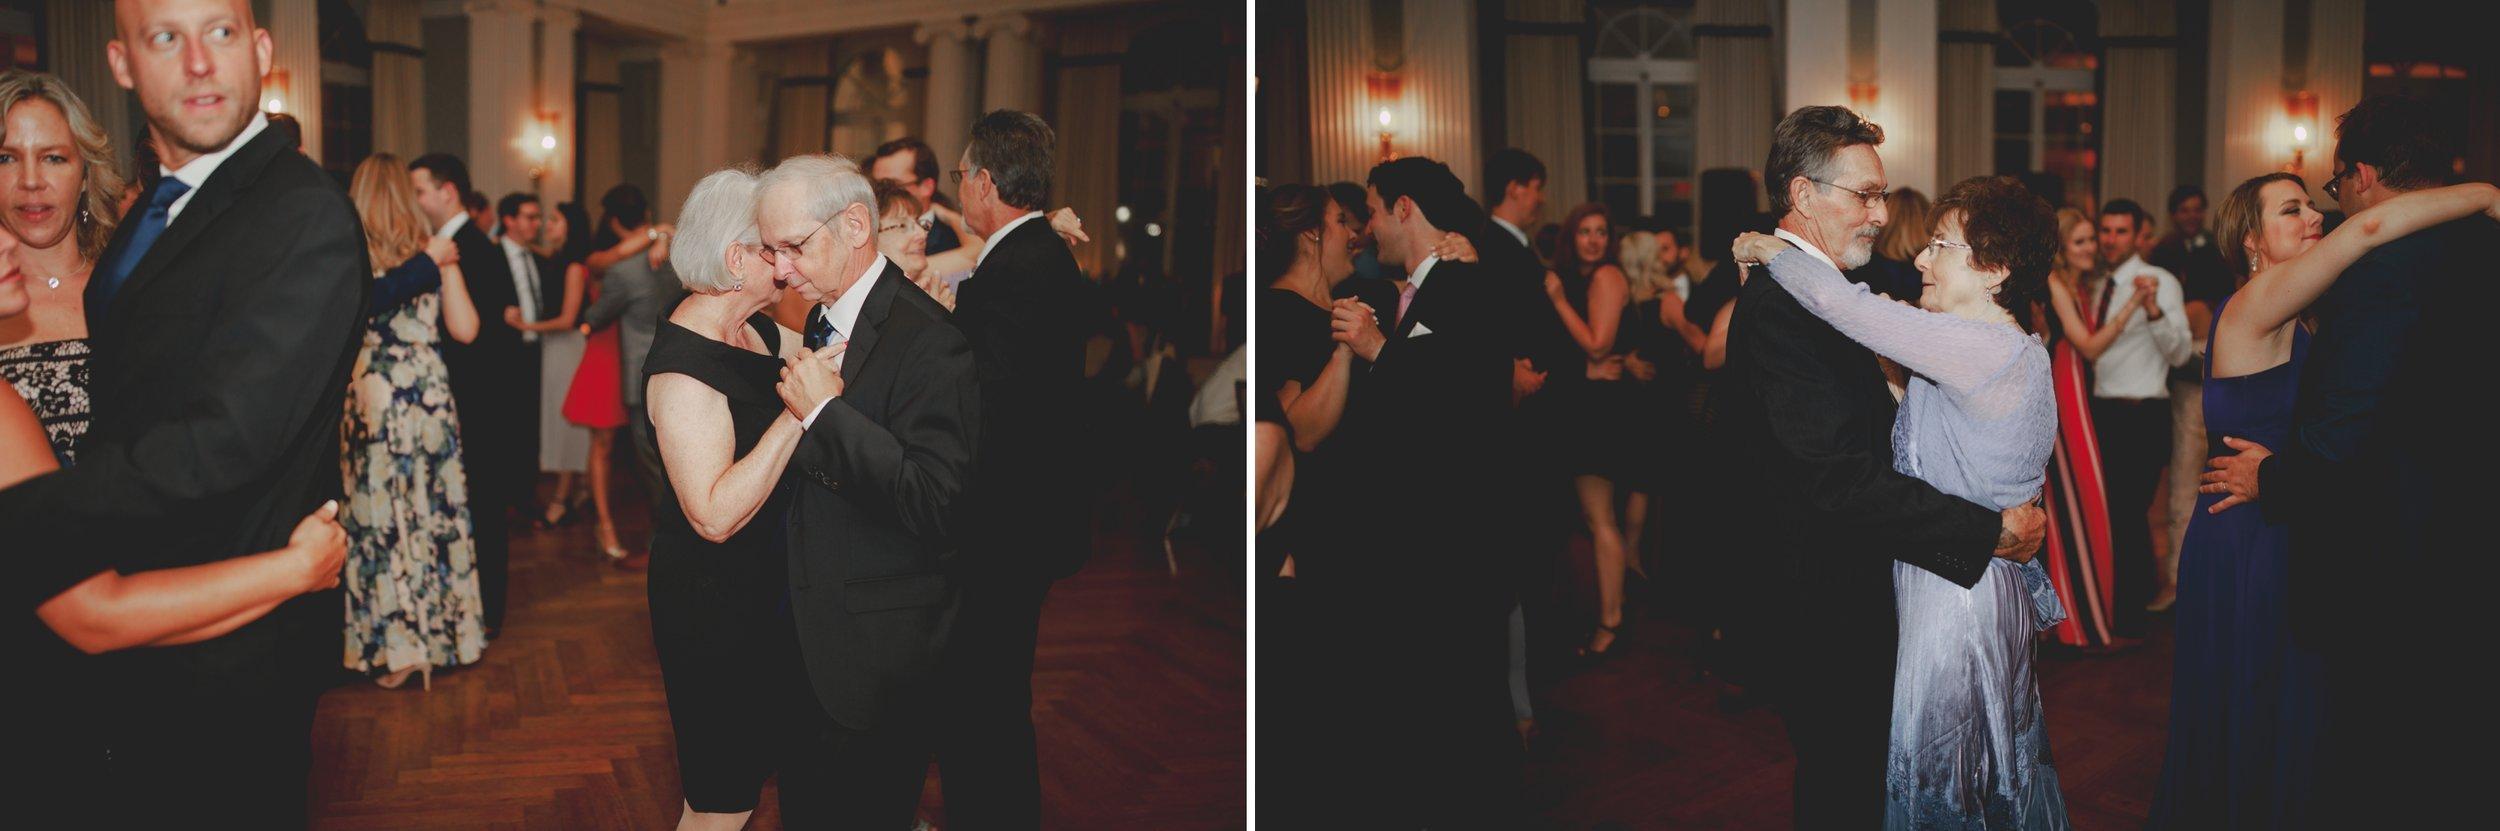 amanda_vanvels_new_york_lgbtq_gay_wedding_103.jpg